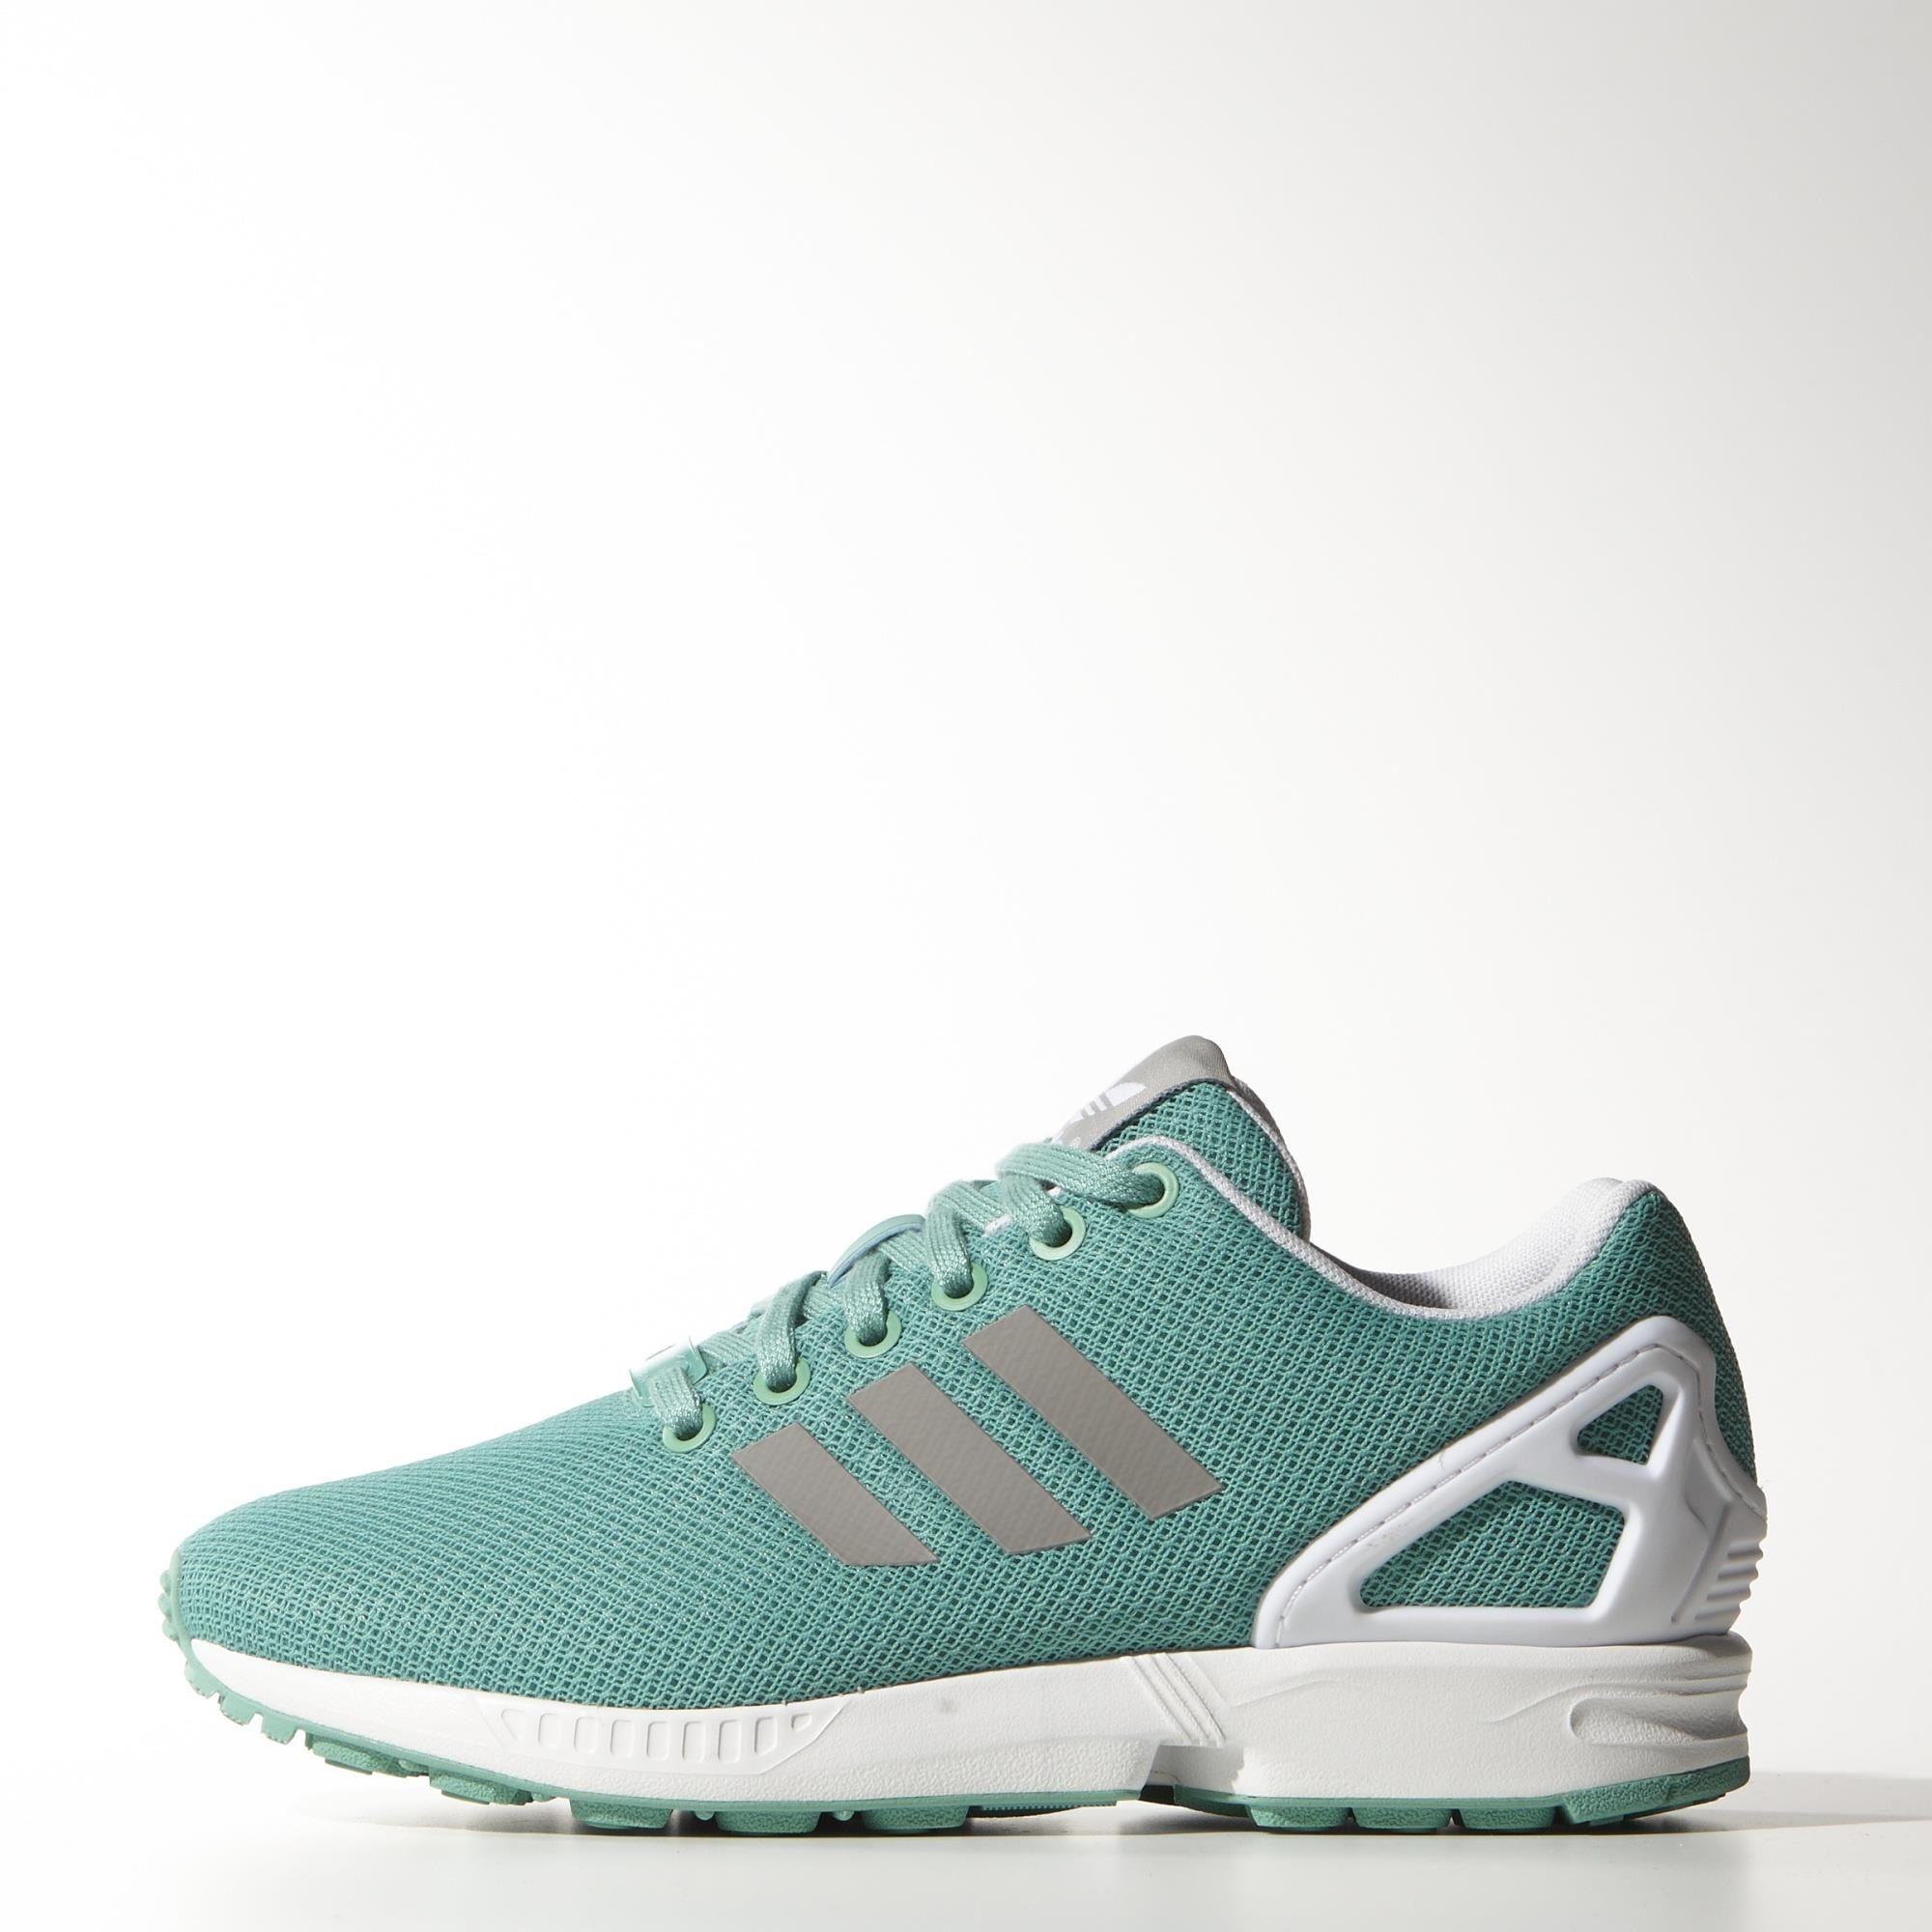 Adidas Originals ZX Flux Shoes St Fade Ocean For Women